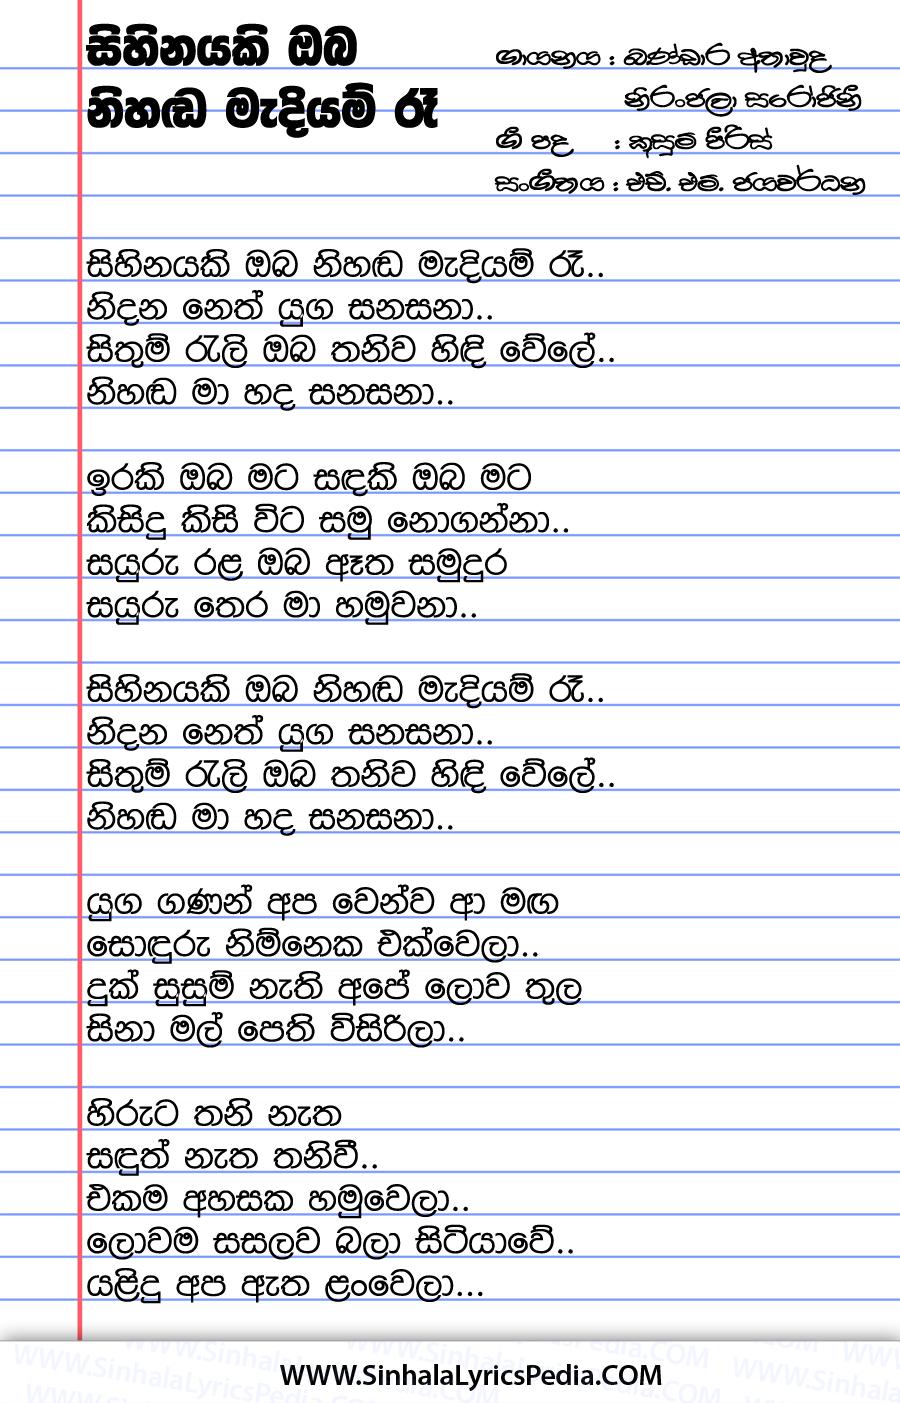 Sihinayaki Oba Nihada Madiyam Raa Song Lyrics